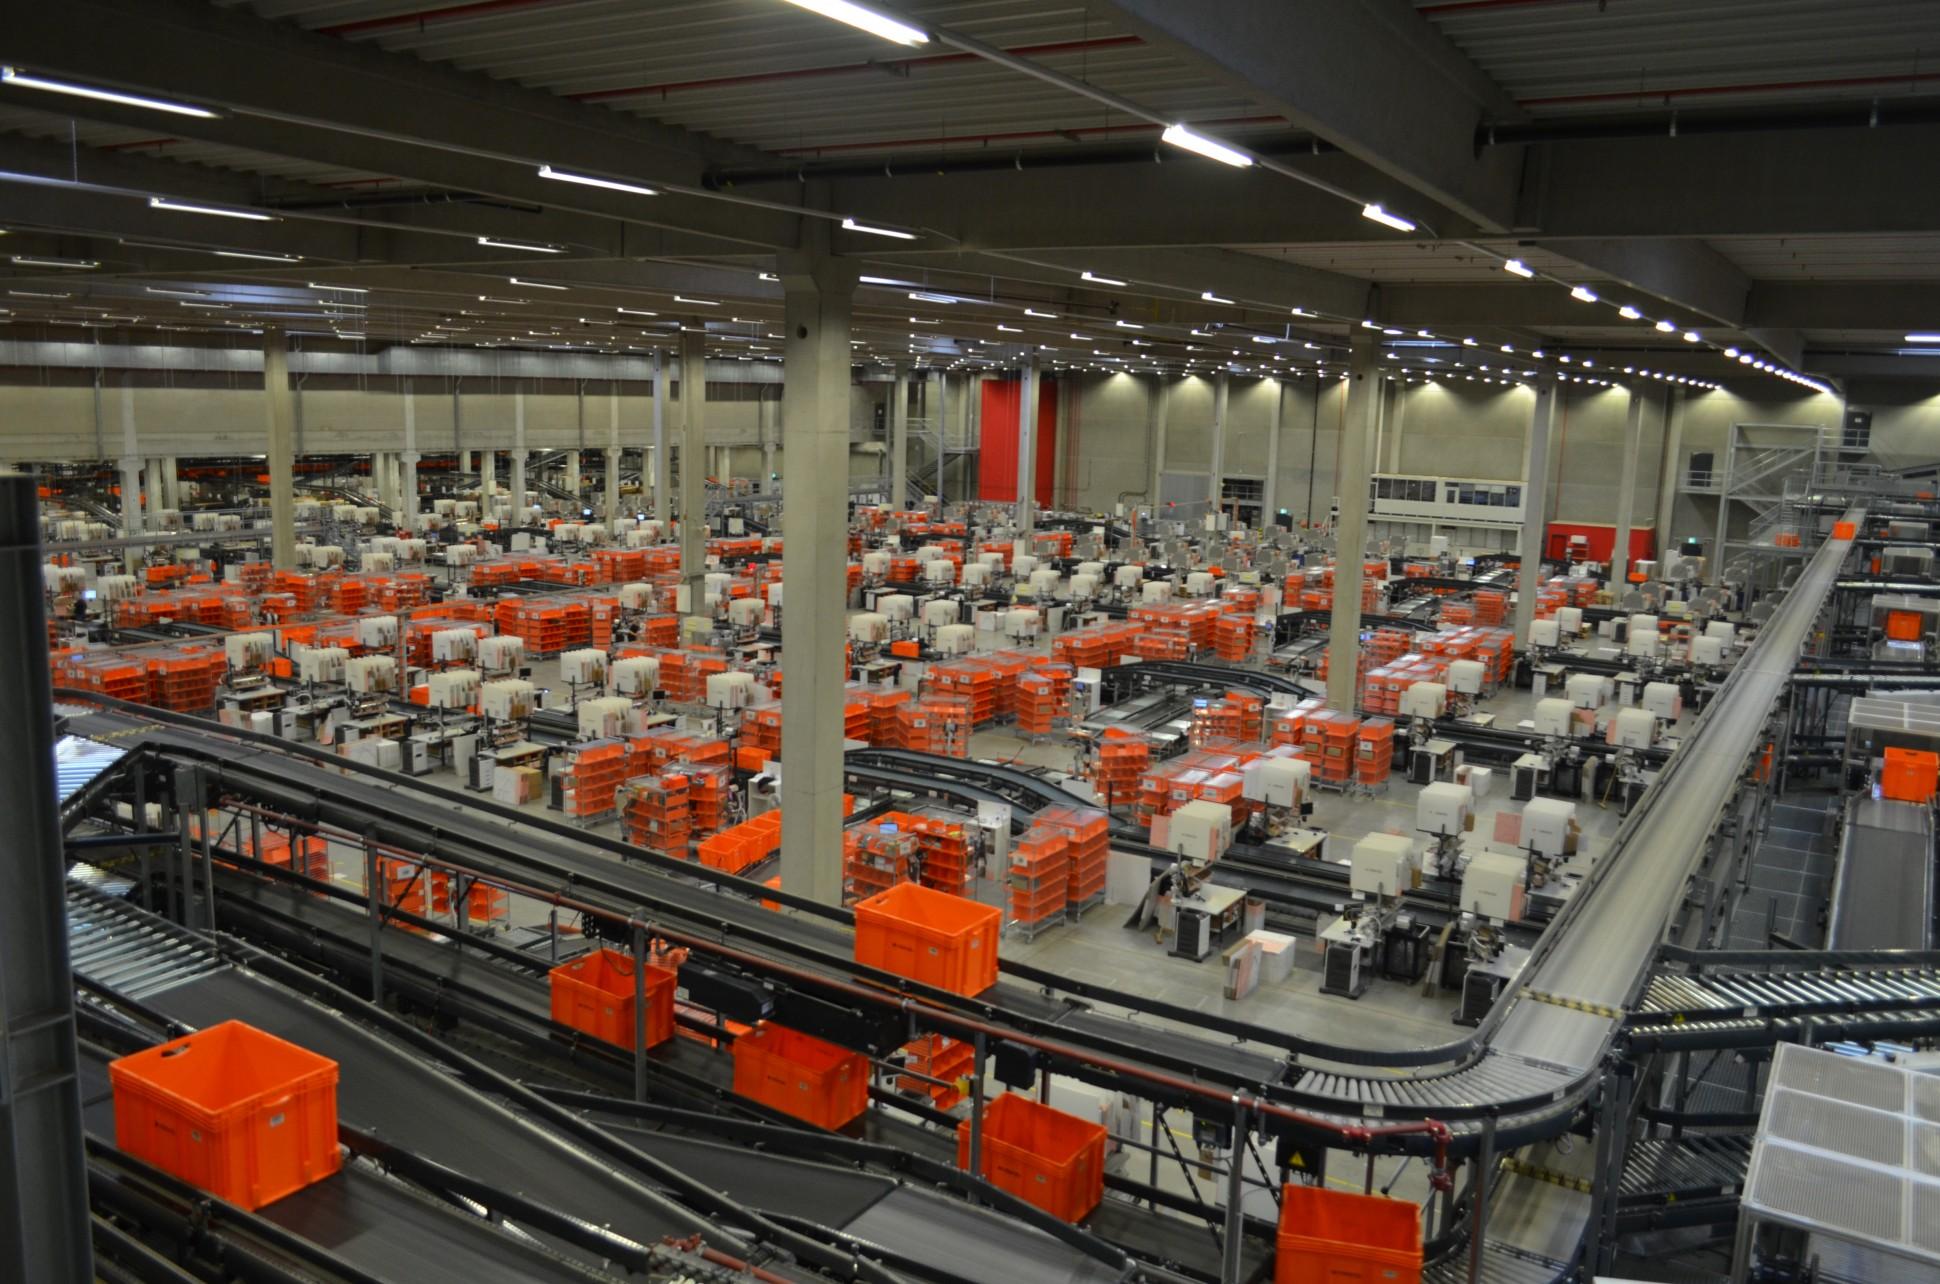 Логистический центр Zalandoв Эрфурте -- крупнейший в Европе узел e-commerce